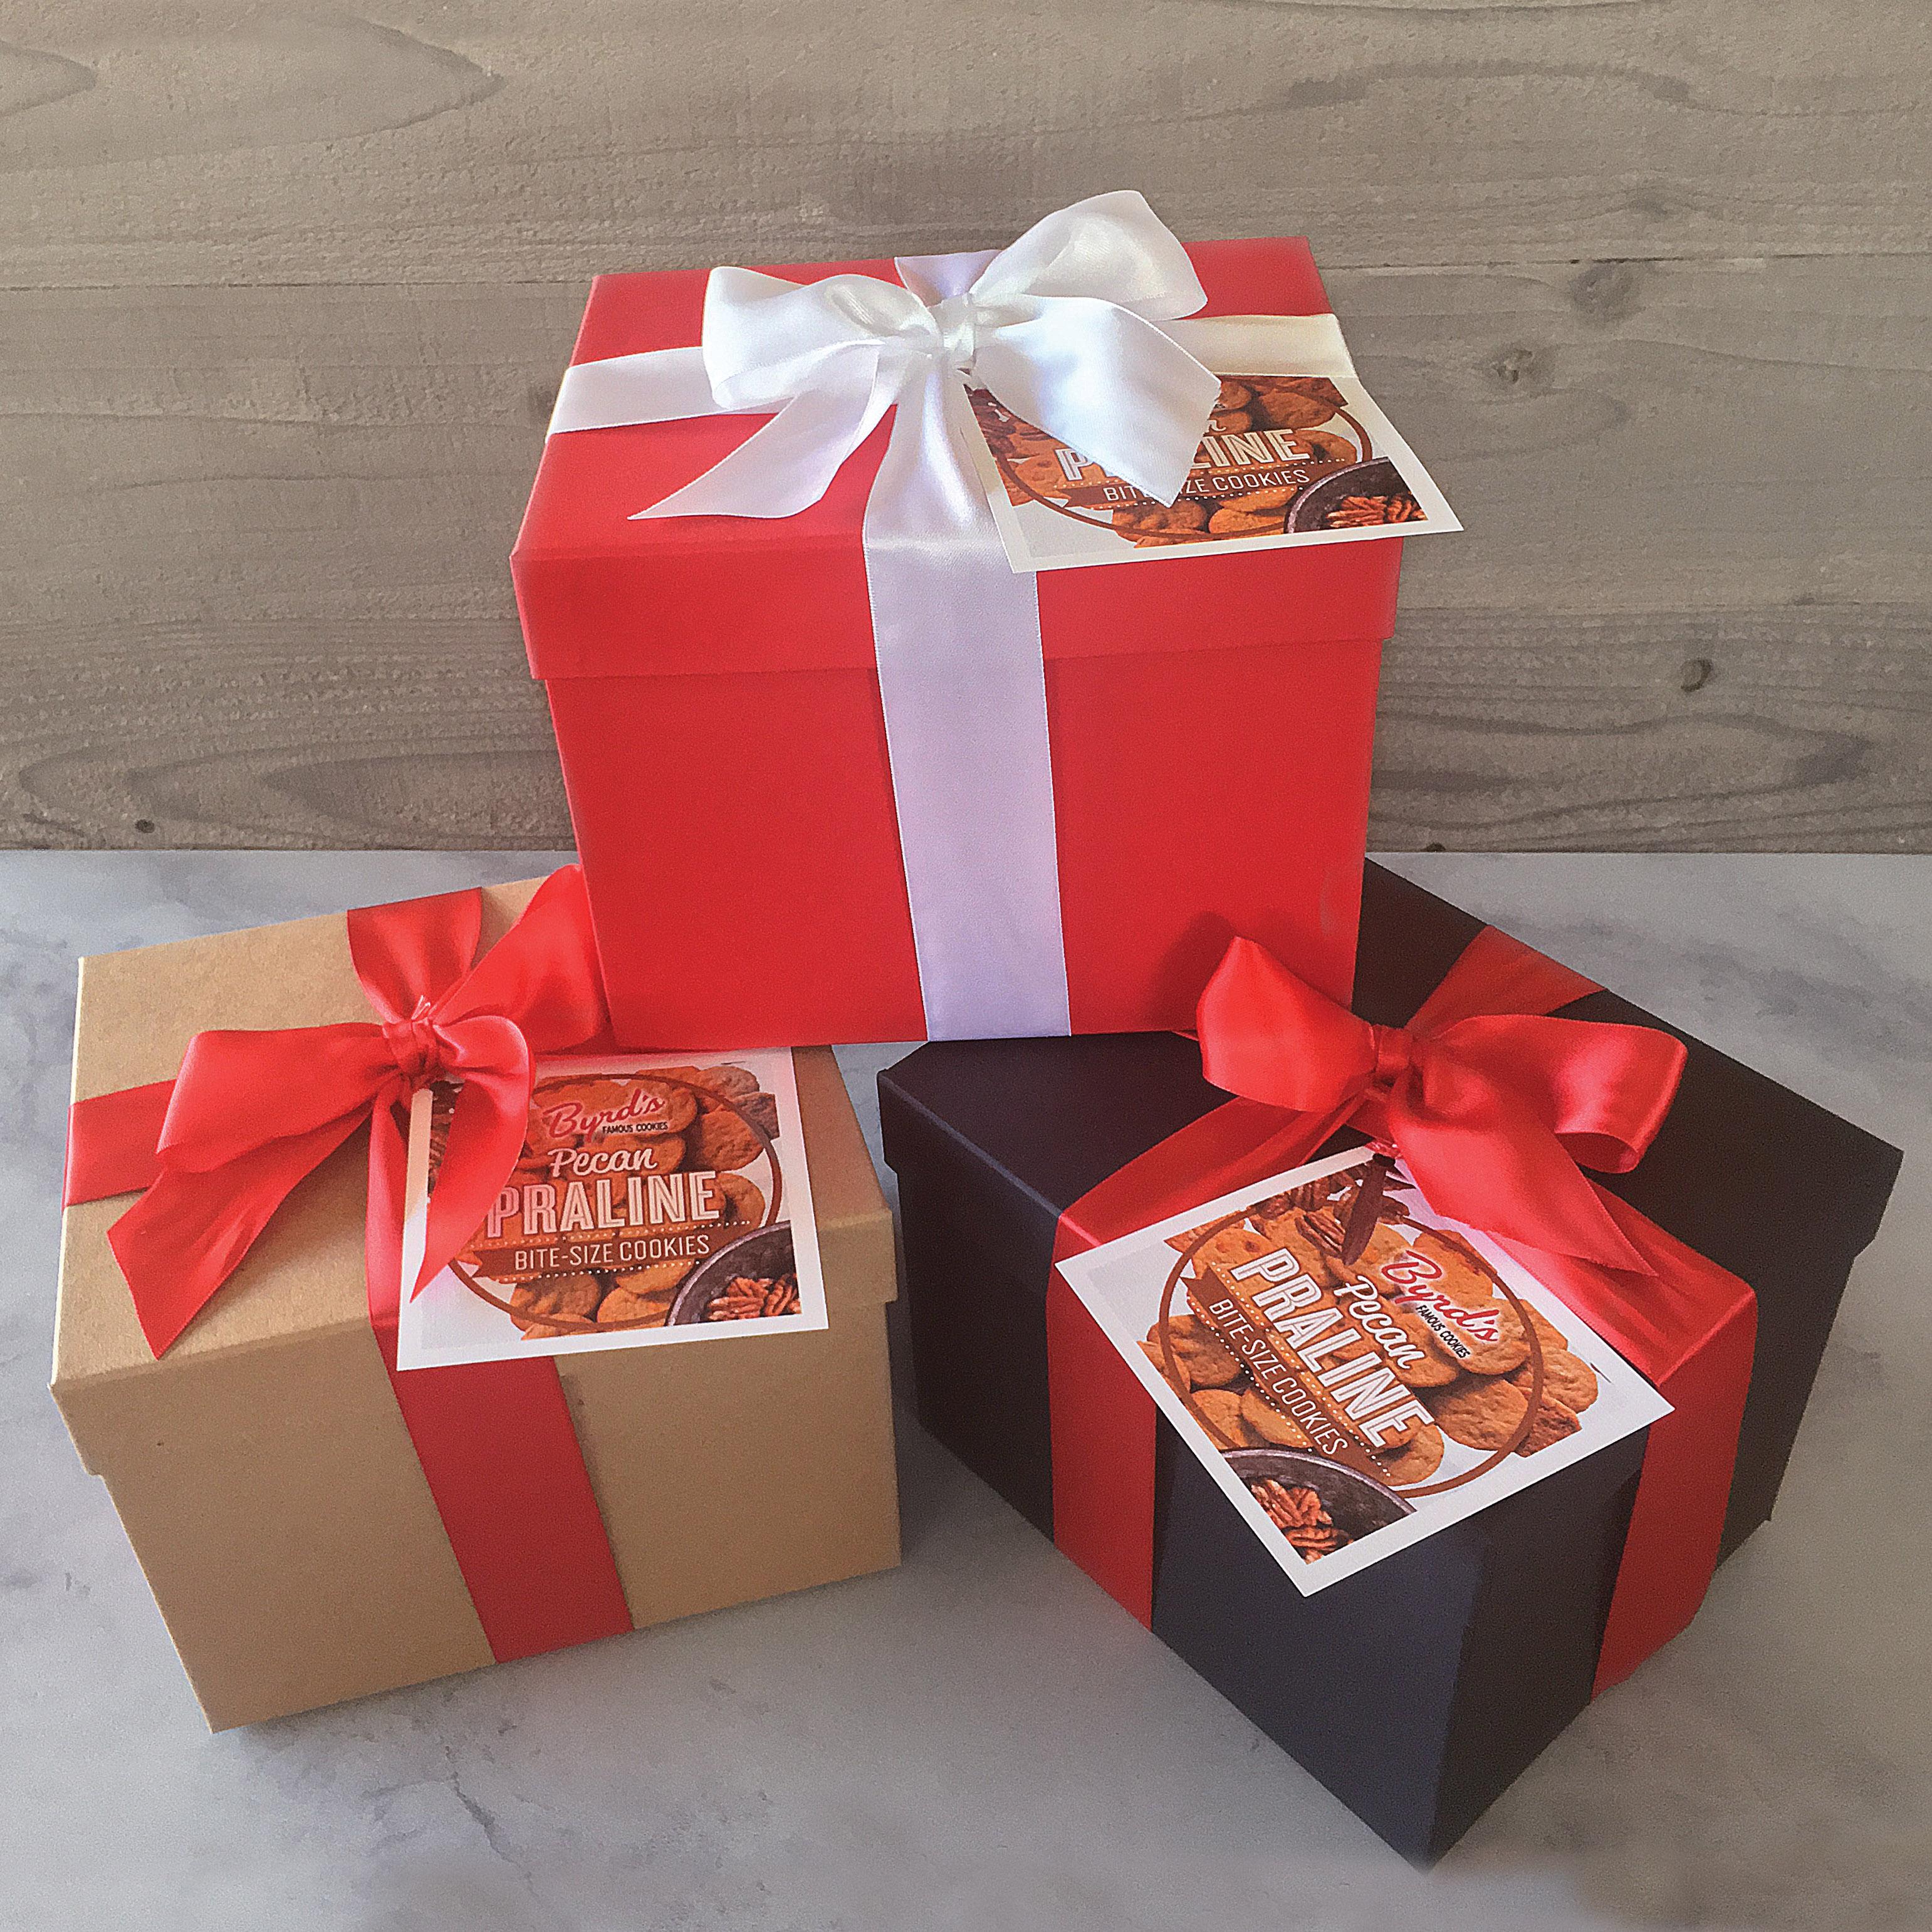 21oz Praline Cookie Gift Box